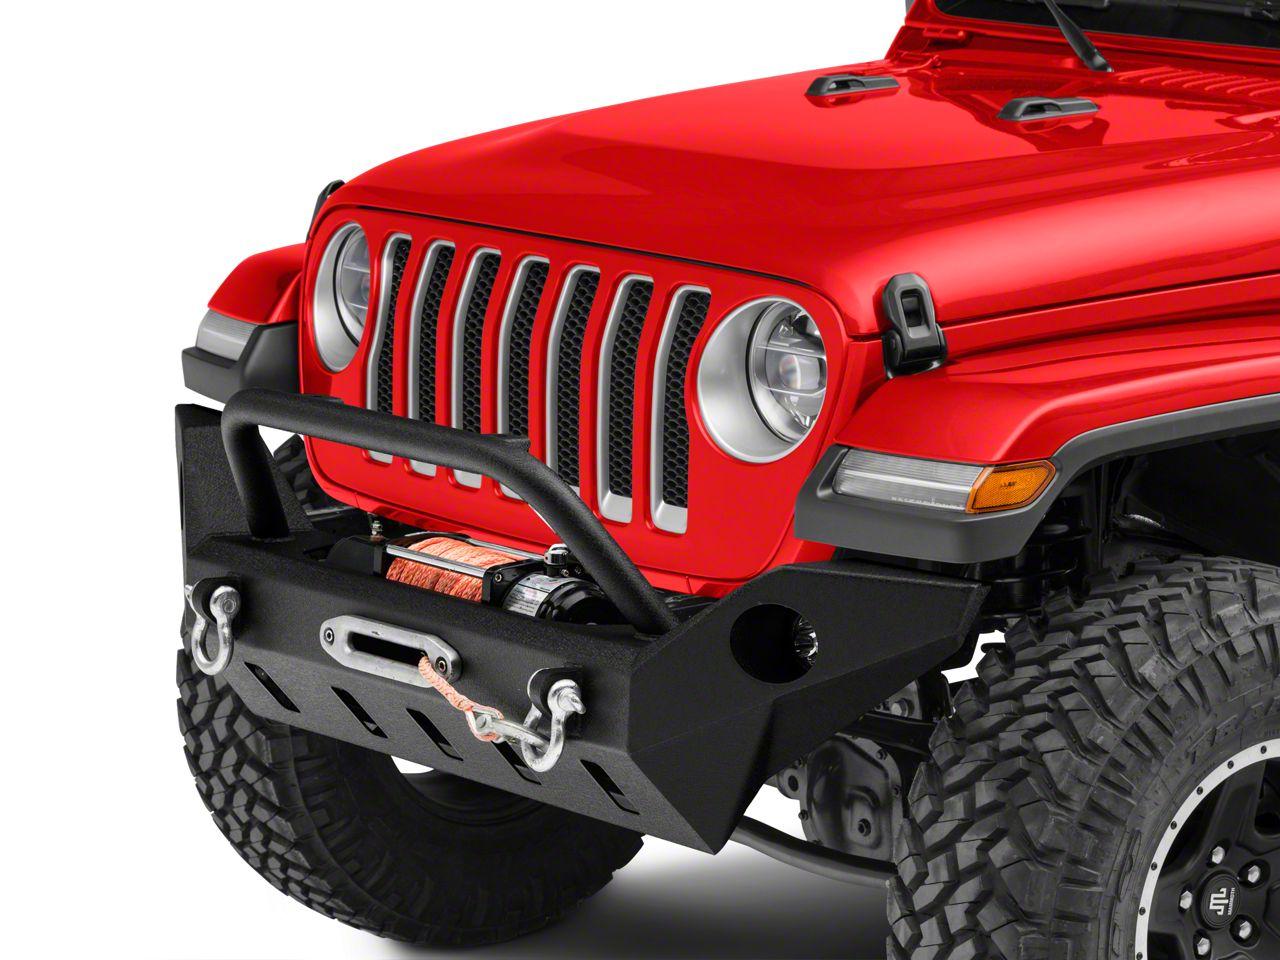 Barricade Extreme HD Full Width Front Bumper w/ LED Fog Lights (18-19 Jeep Wrangler JL)